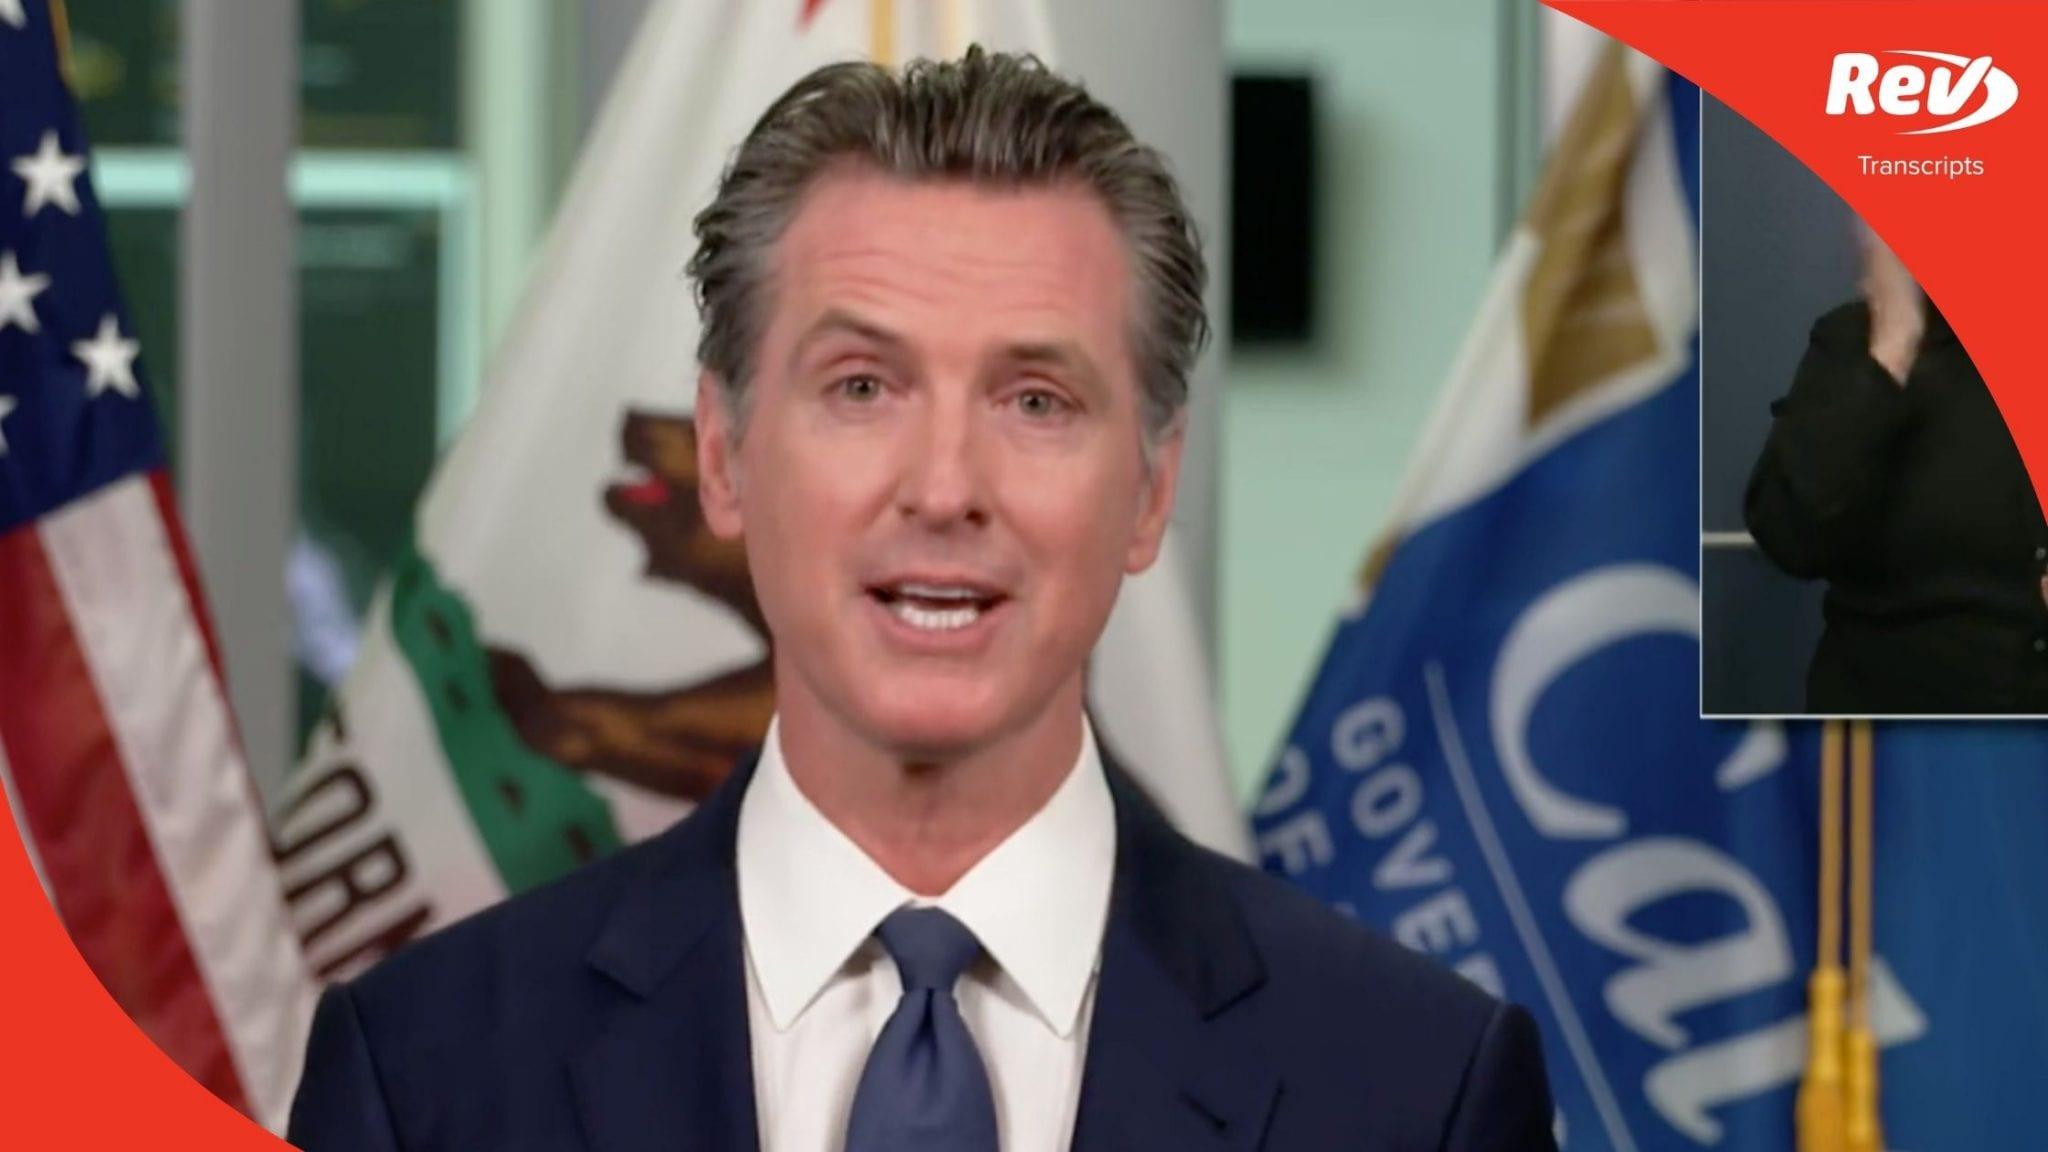 California Governor Gavin Newsom August 17 Press Conference Transcript